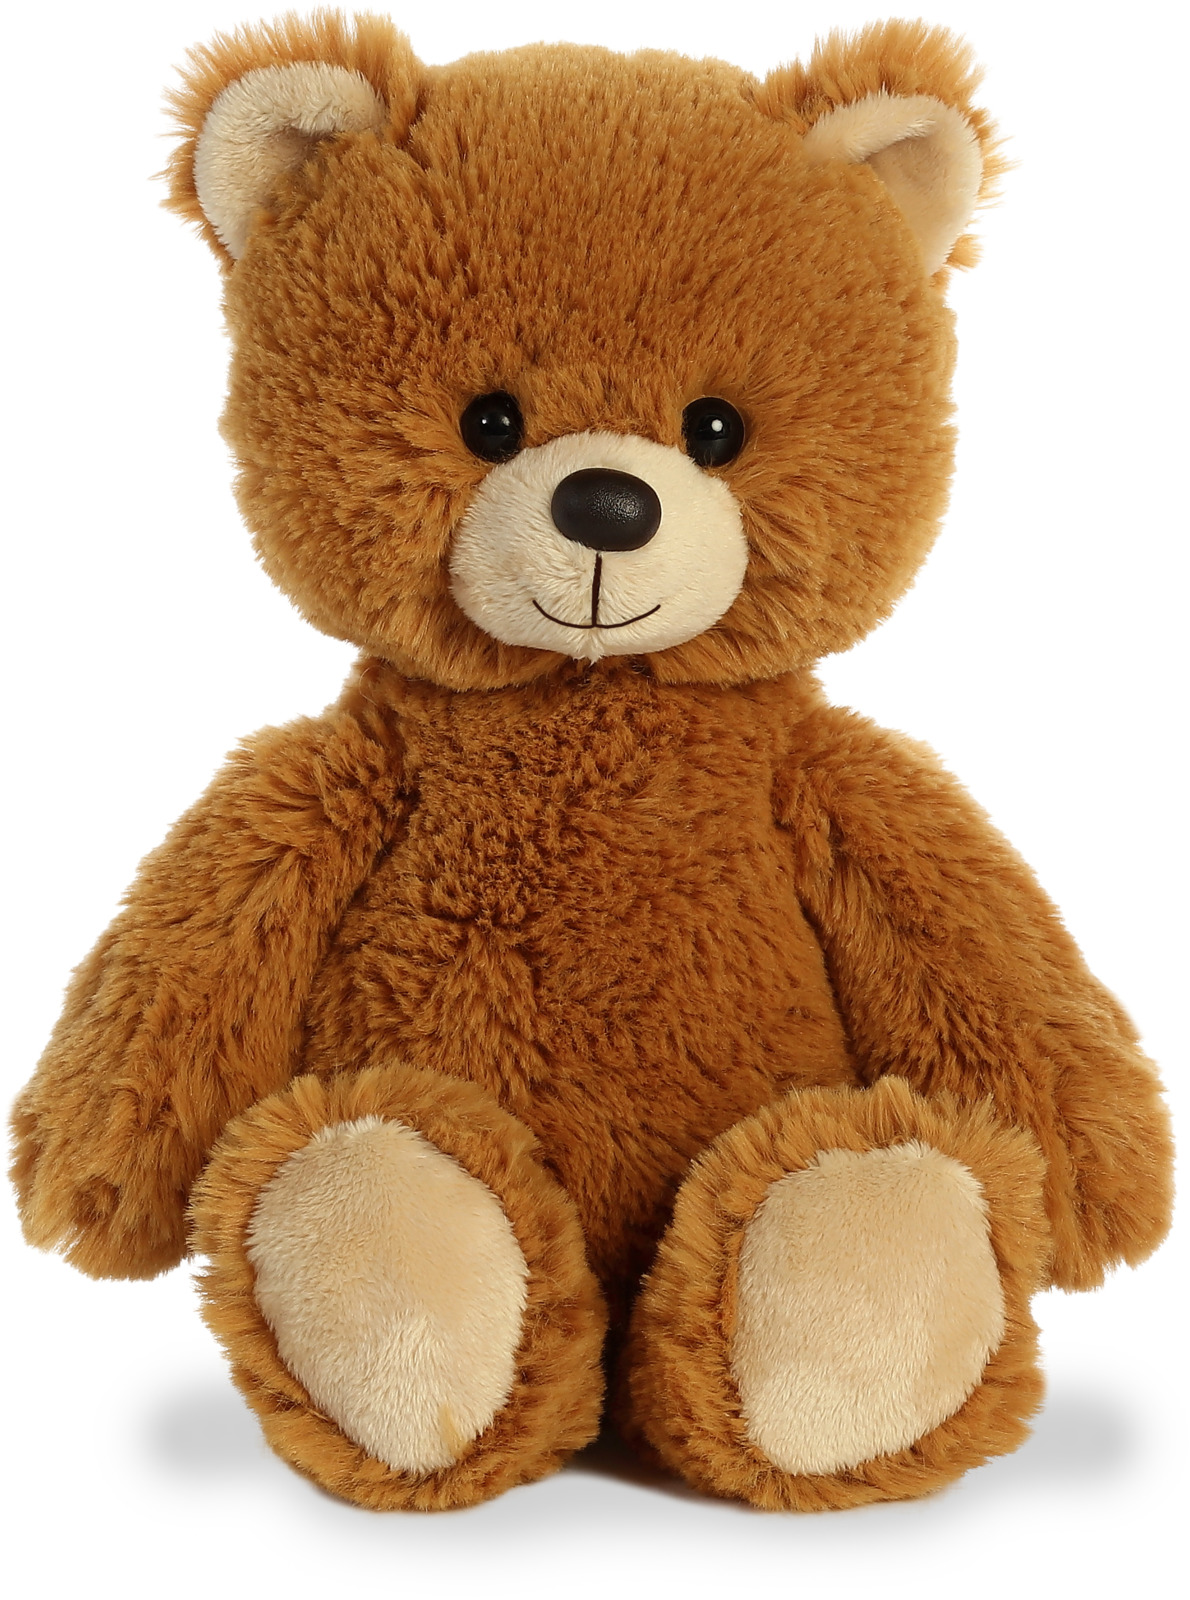 Игрушка мягкая Aurora Cuddly Friends Медвежонок, 180154C, 30 см мягкая игрушка хаски aurora cuddly friends текстиль пластик плюш белый серый 30 см